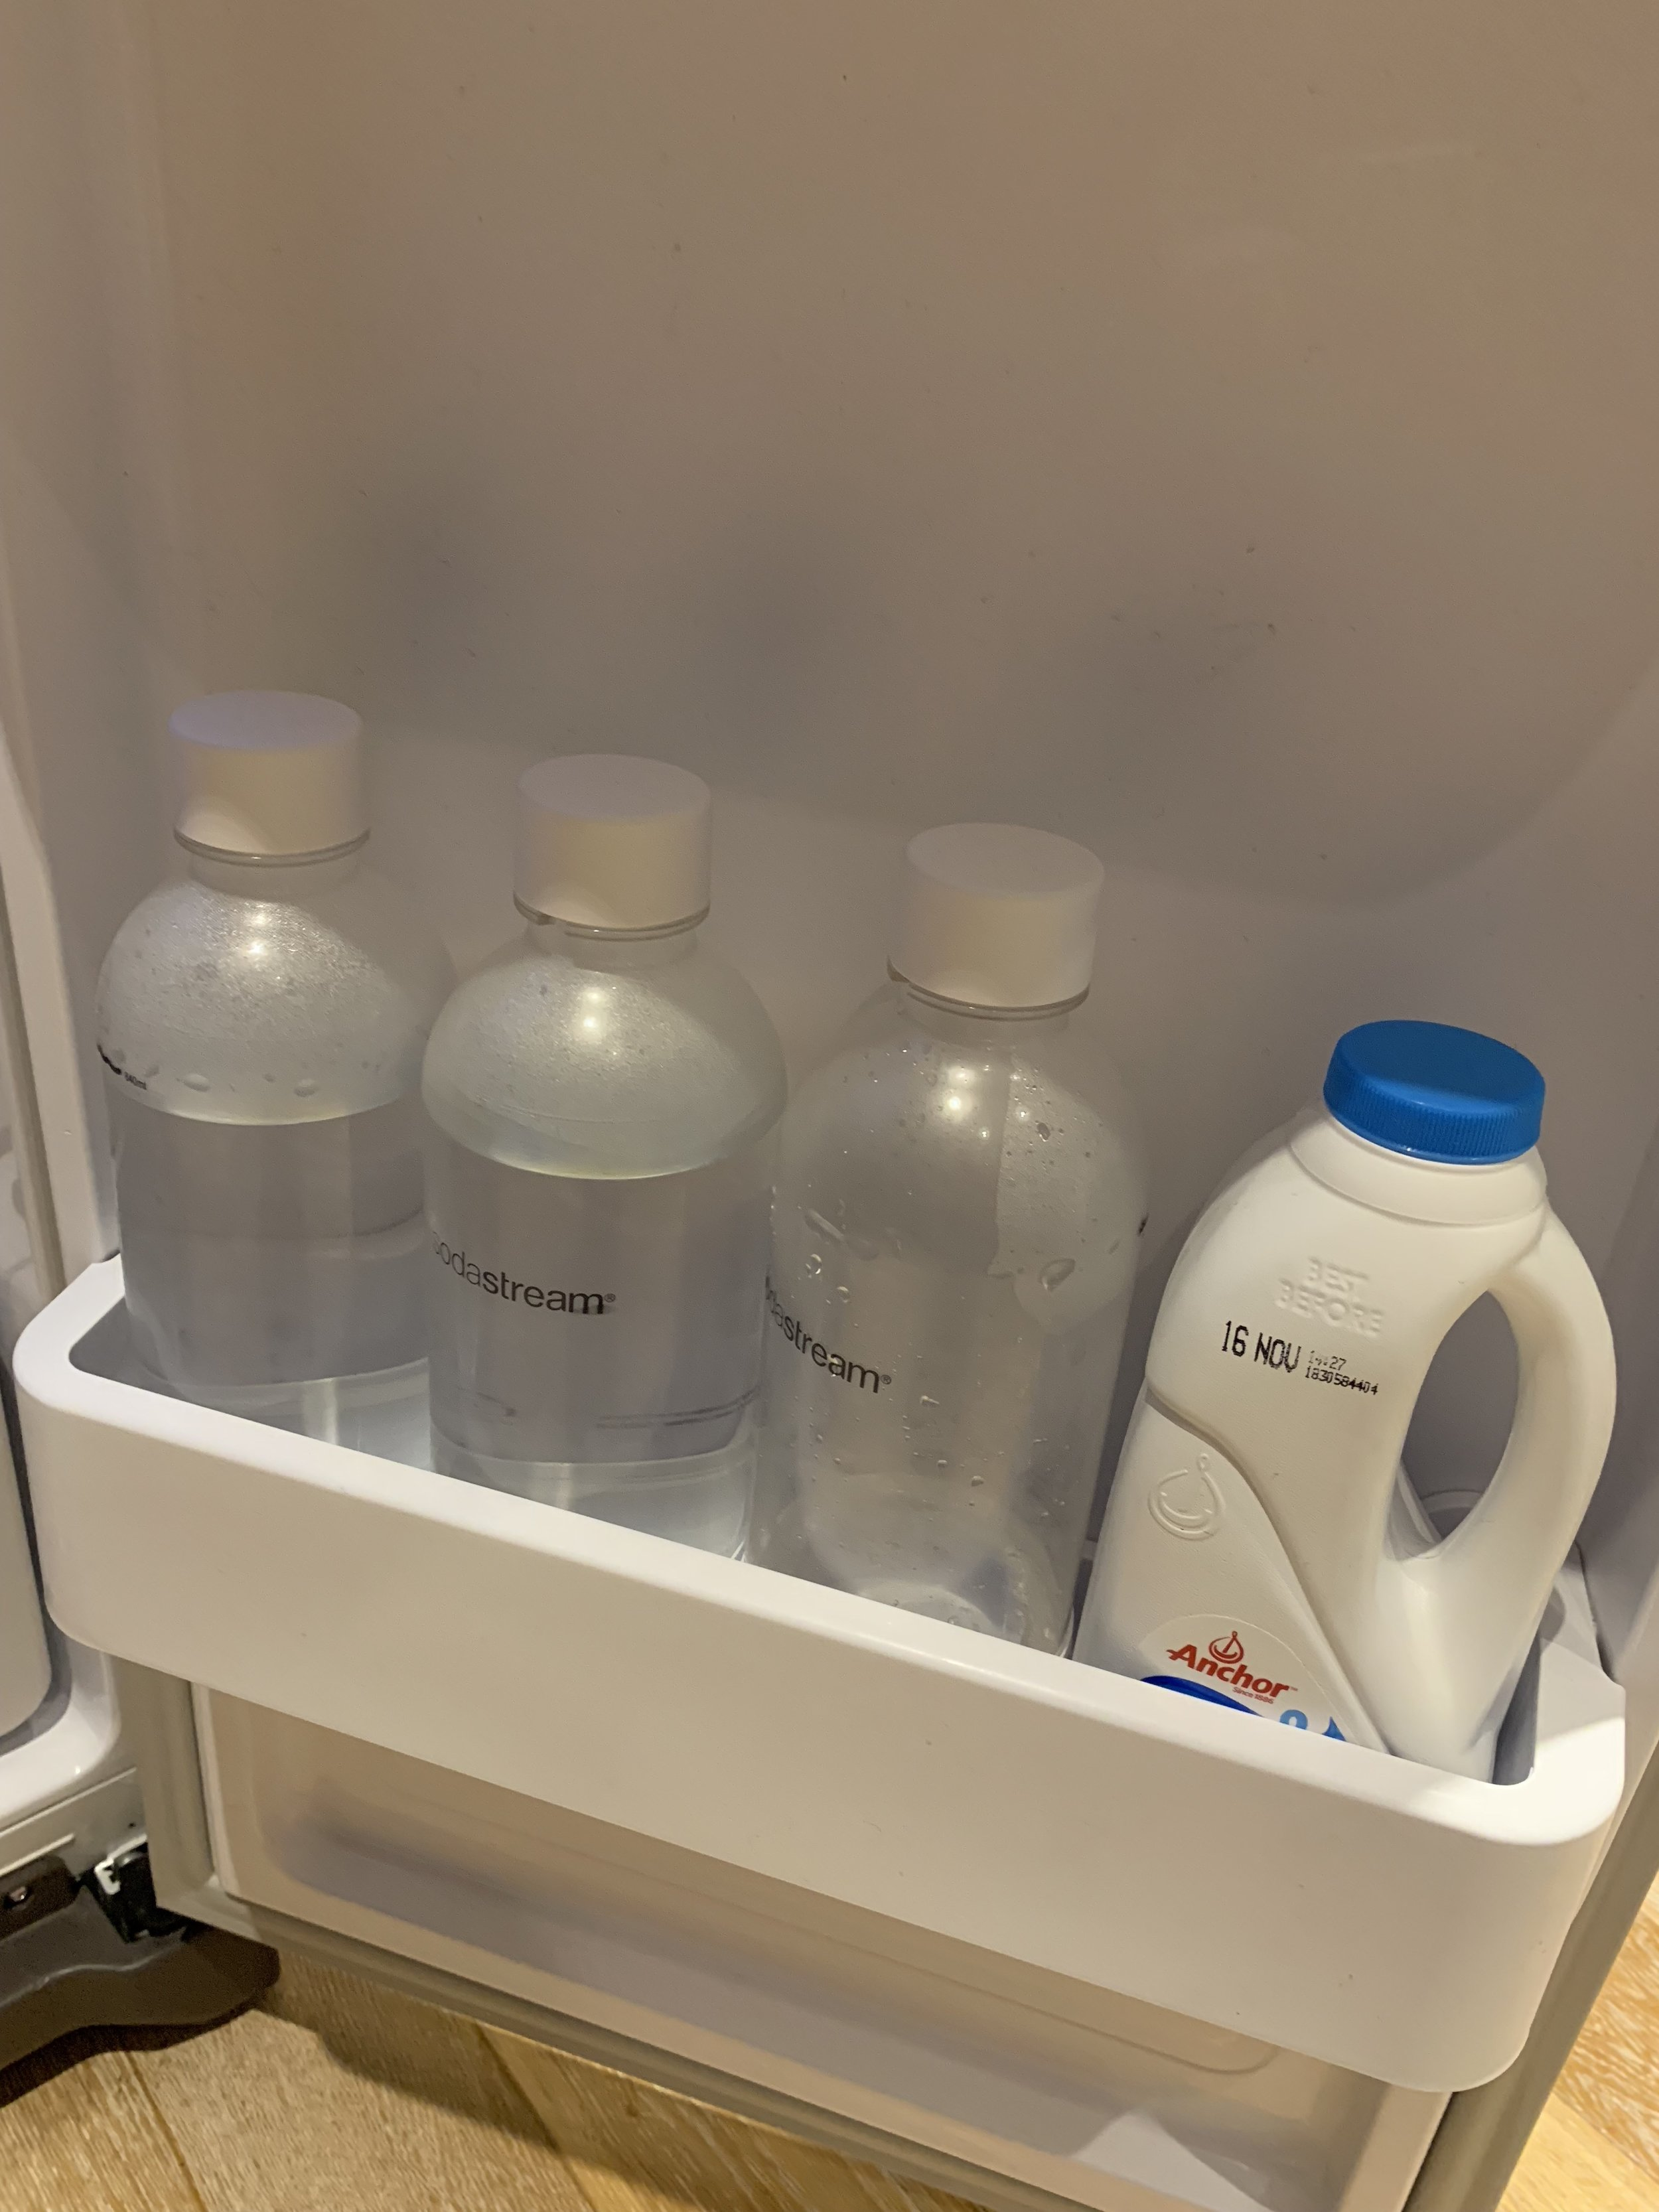 Sodastream setup (L-R: Bottles #3, #2, #1)